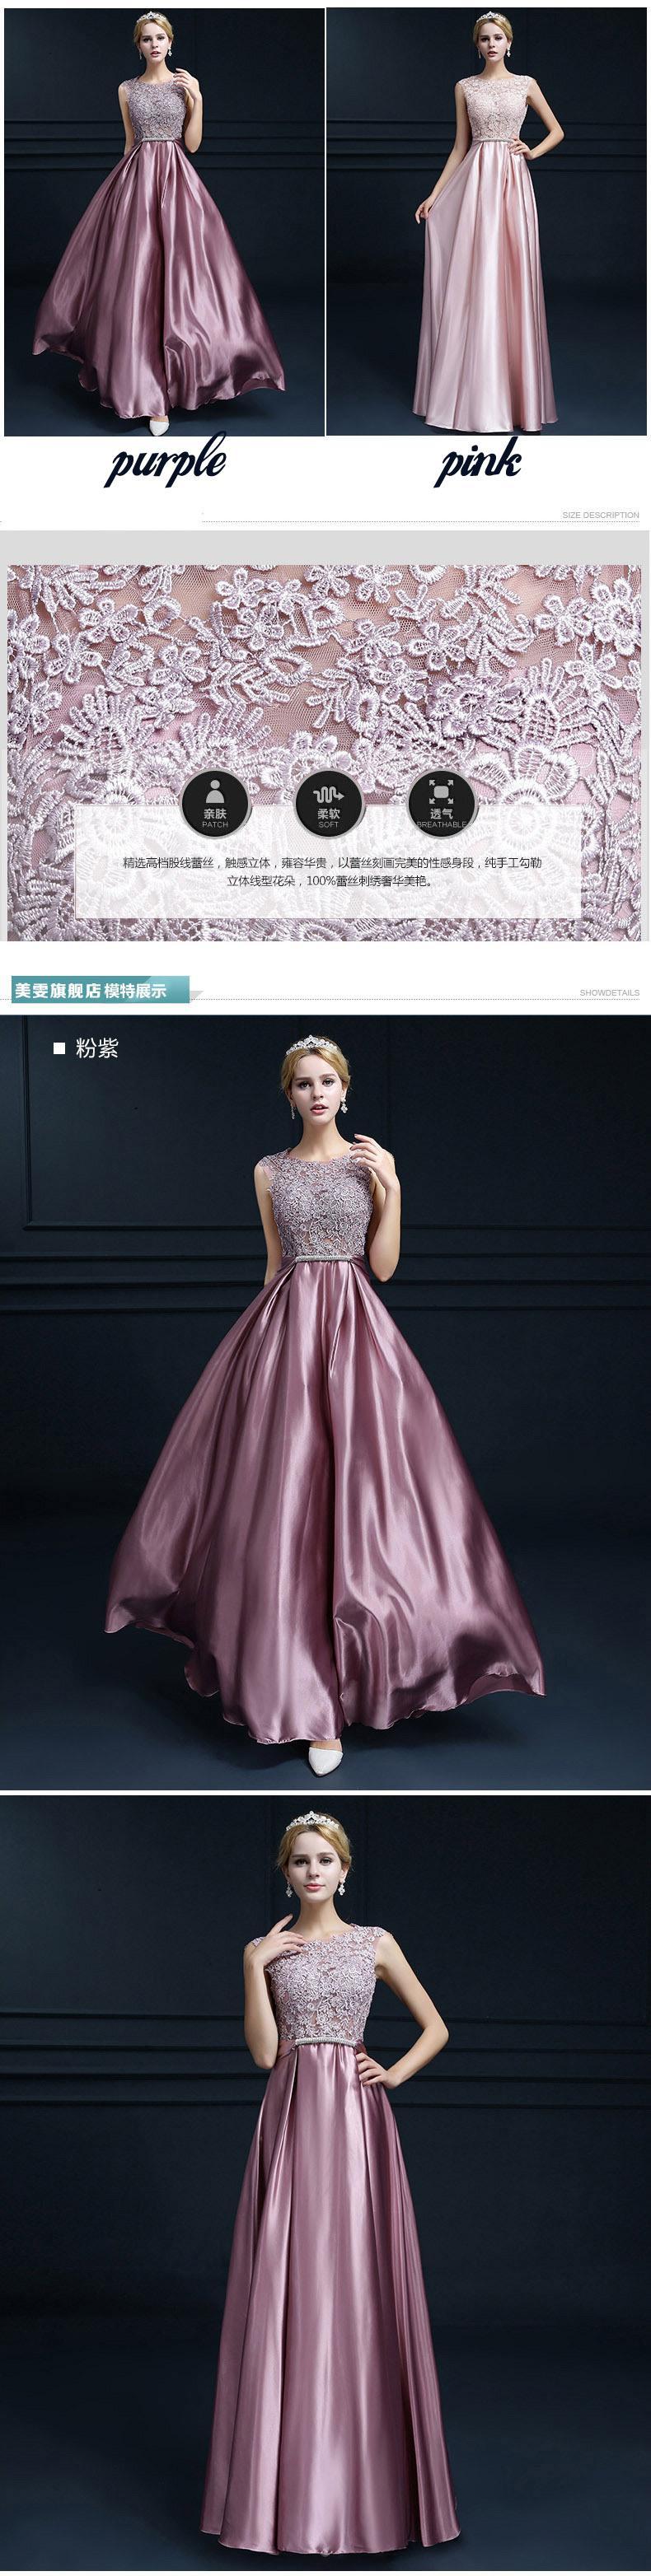 Brand Design Prom Dresses Illusion Bodice Lace Formal Prom Dresses ...